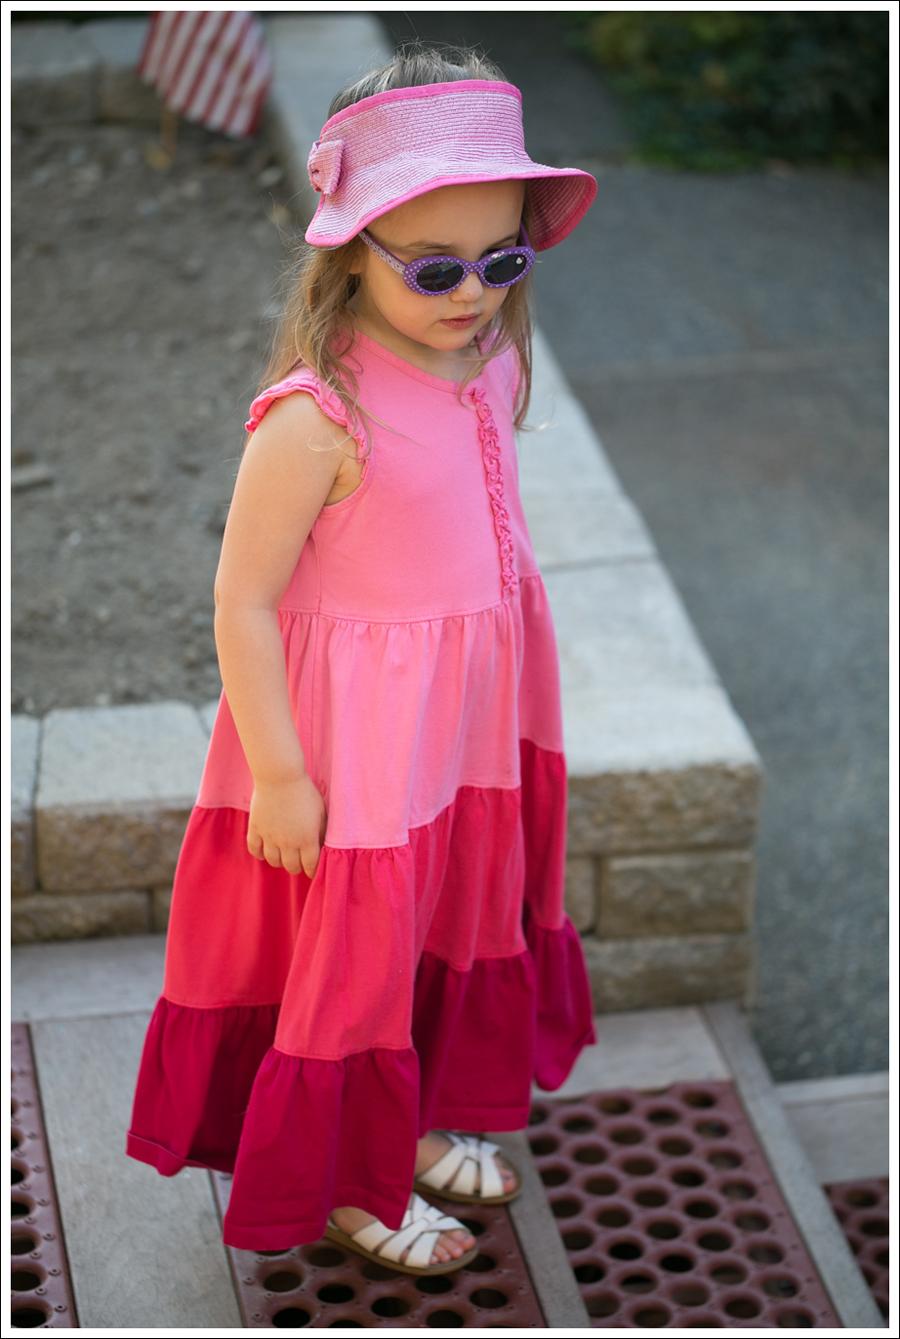 Blog Hanna Andersson Pink Twirl Dress White Saltwater Sandals-1